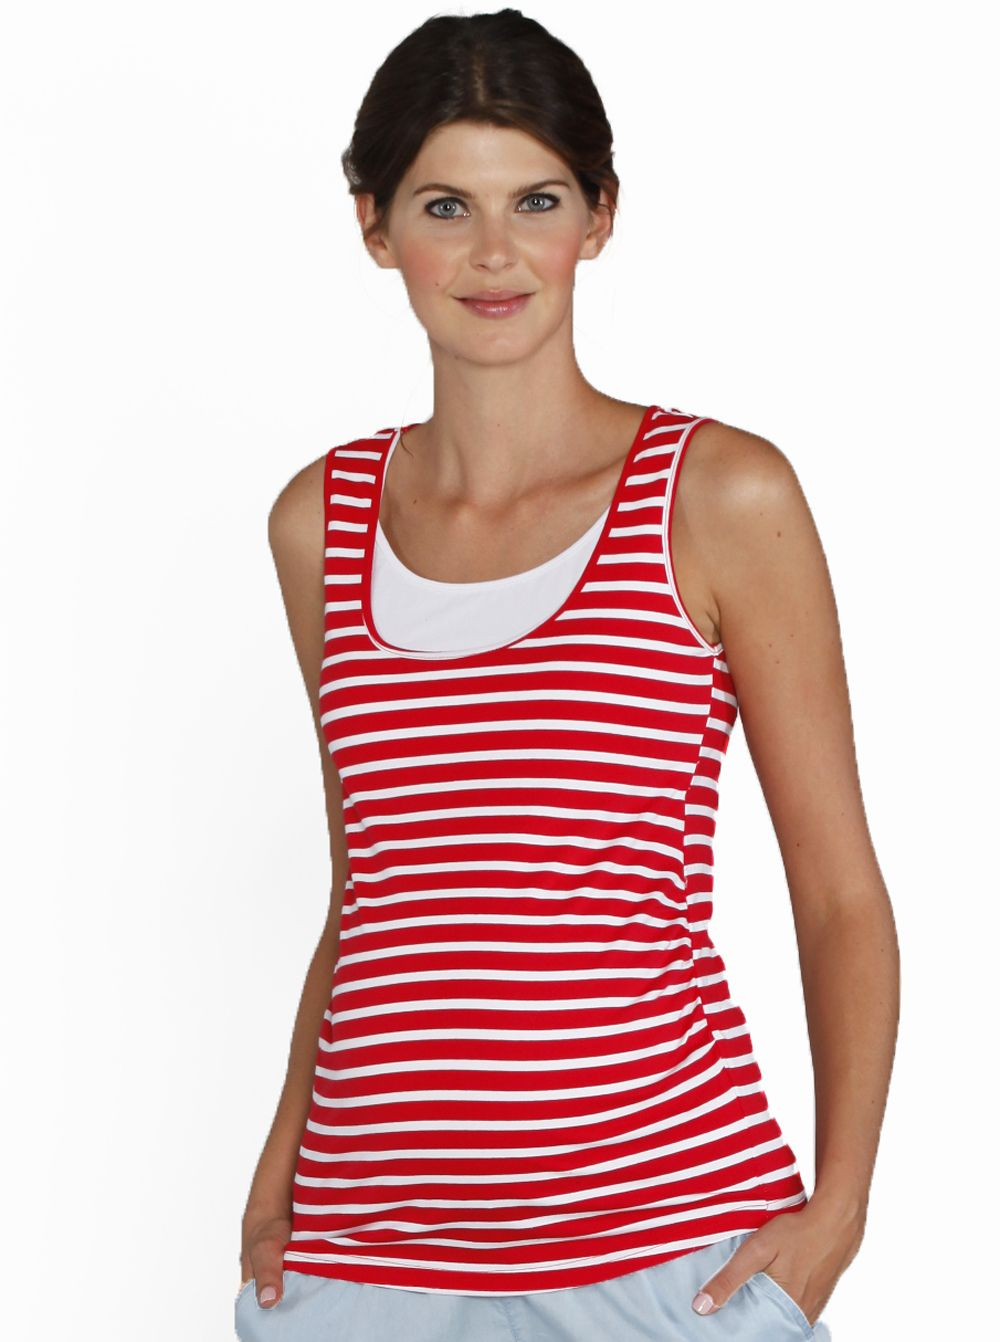 Basic Breastfeeding Nursing Tank in Red Stripes   baby   Pinterest ...